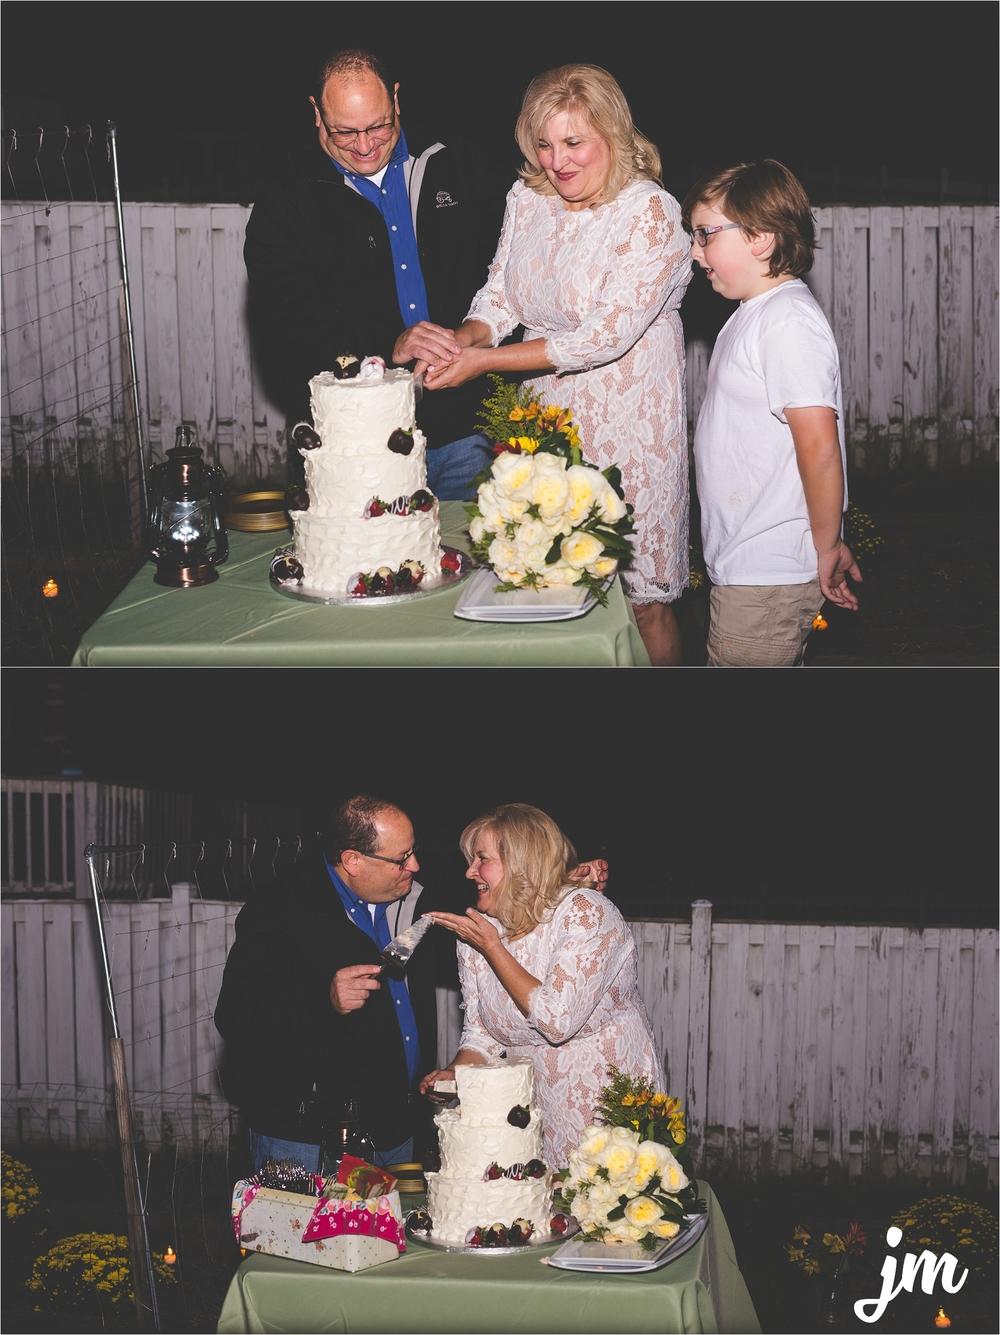 backyard-wedding-pacific-northwest-photographer-jannicka-mayte_0056.jpg